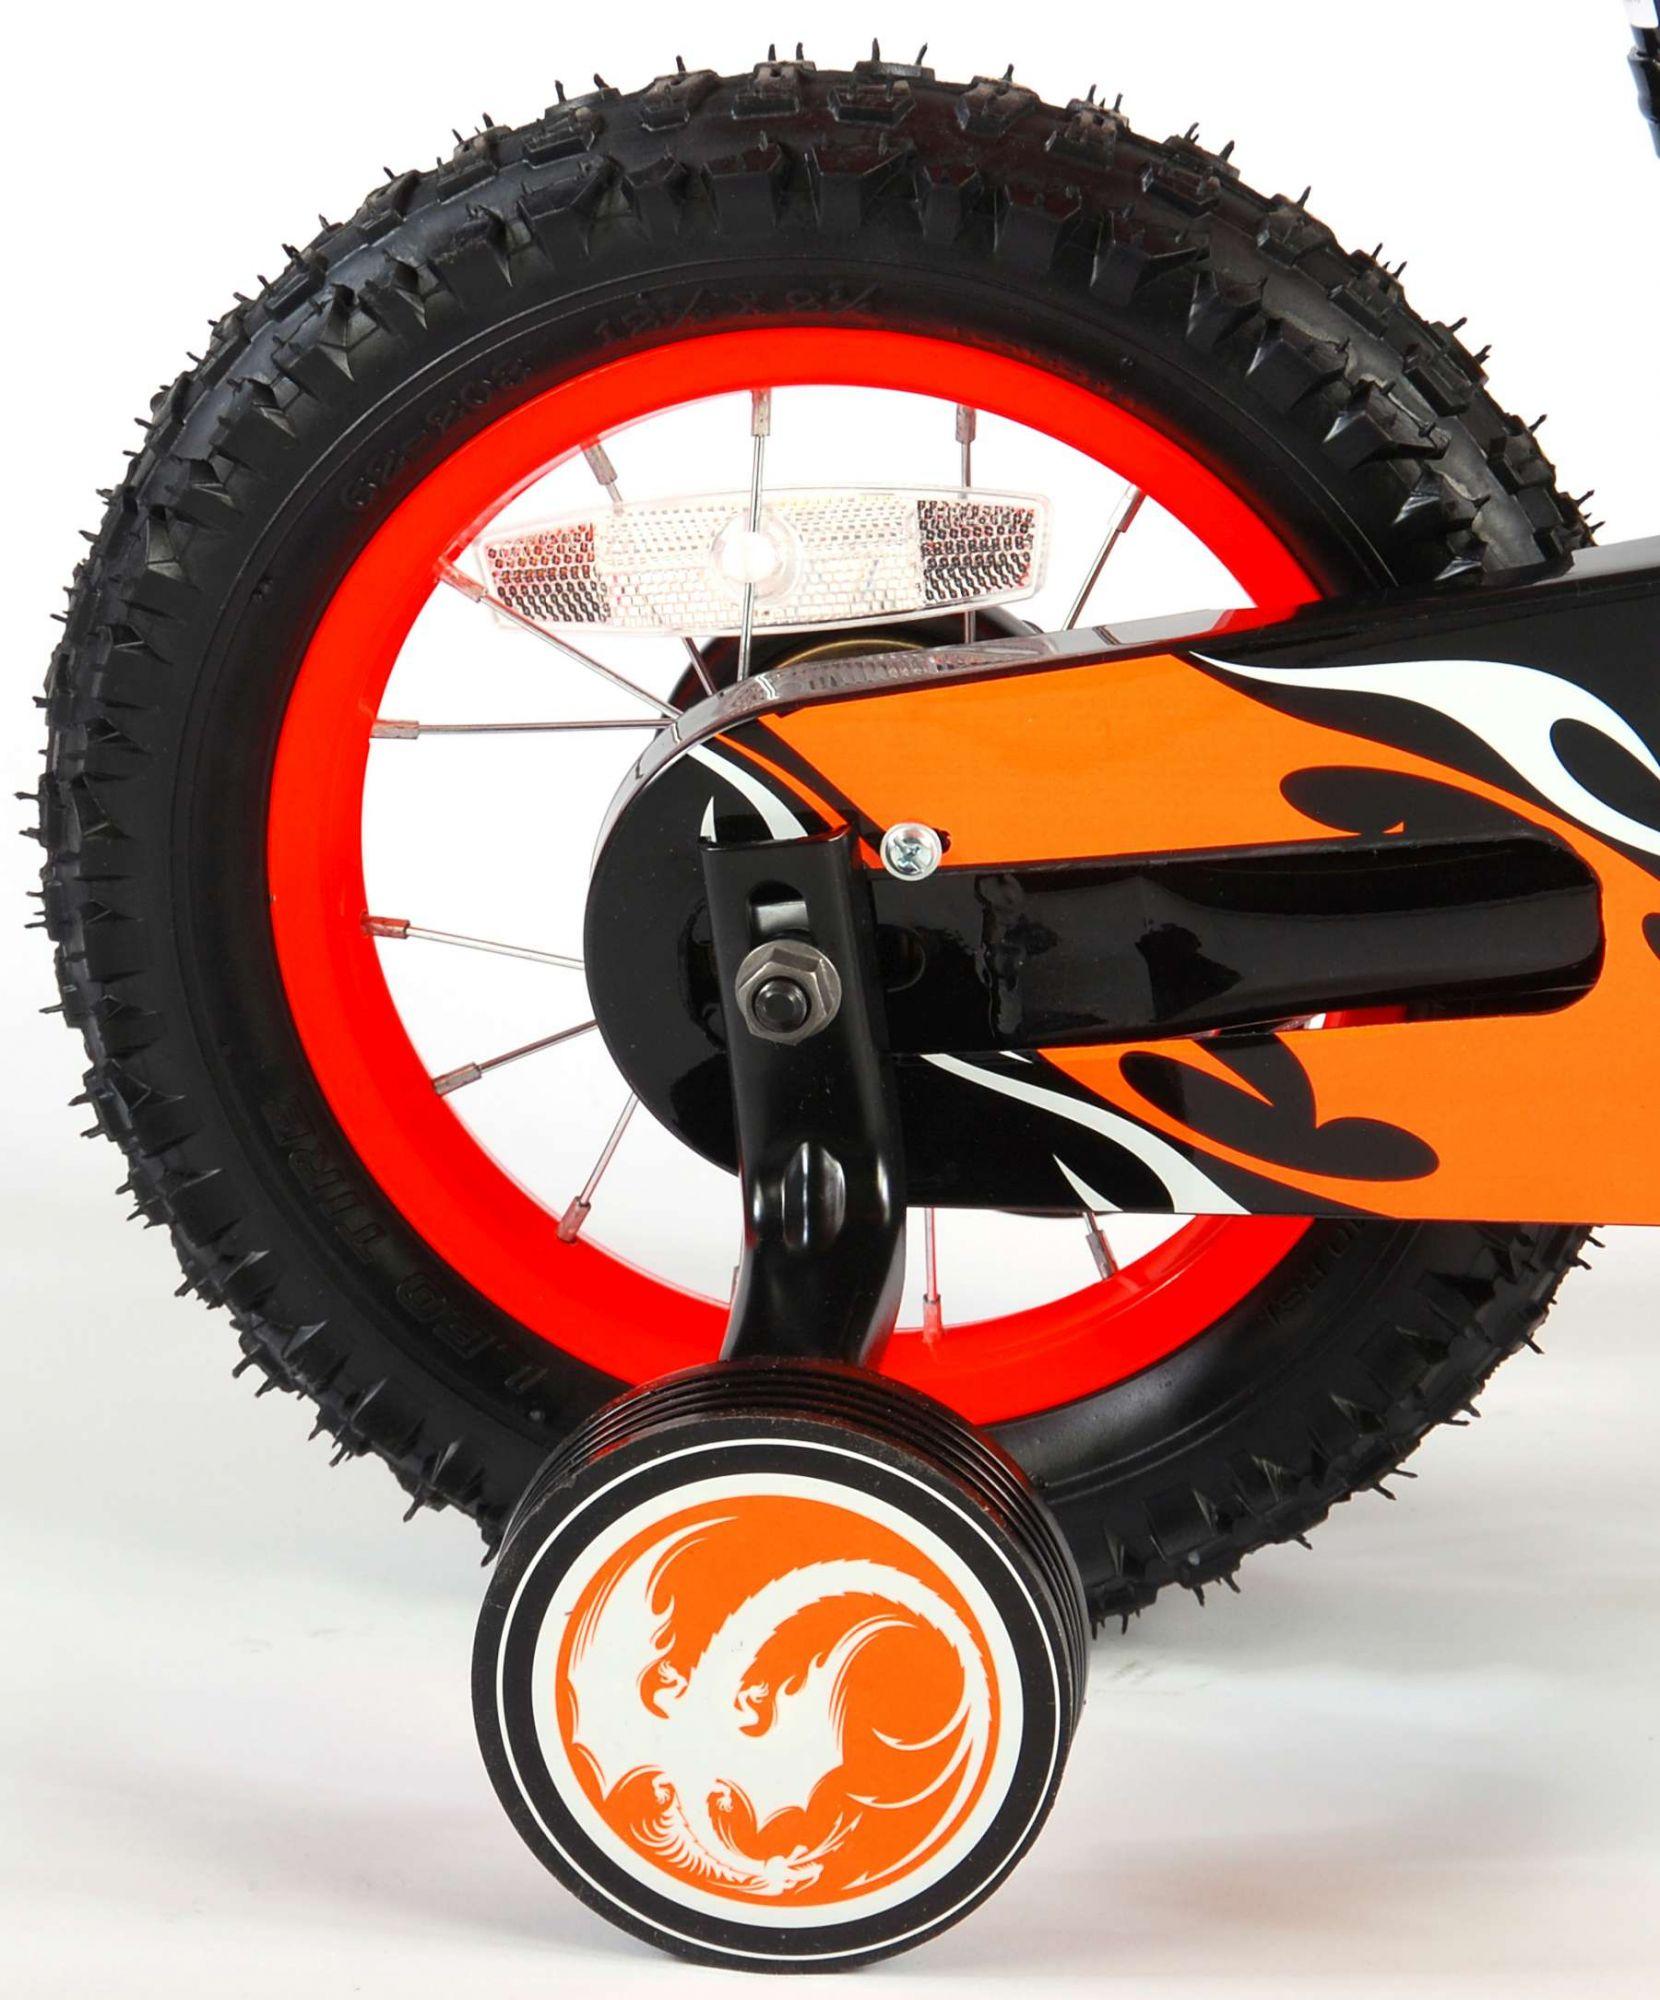 Bicicleta Motorbike de 12 pulgadas Naranja - rueda trasera